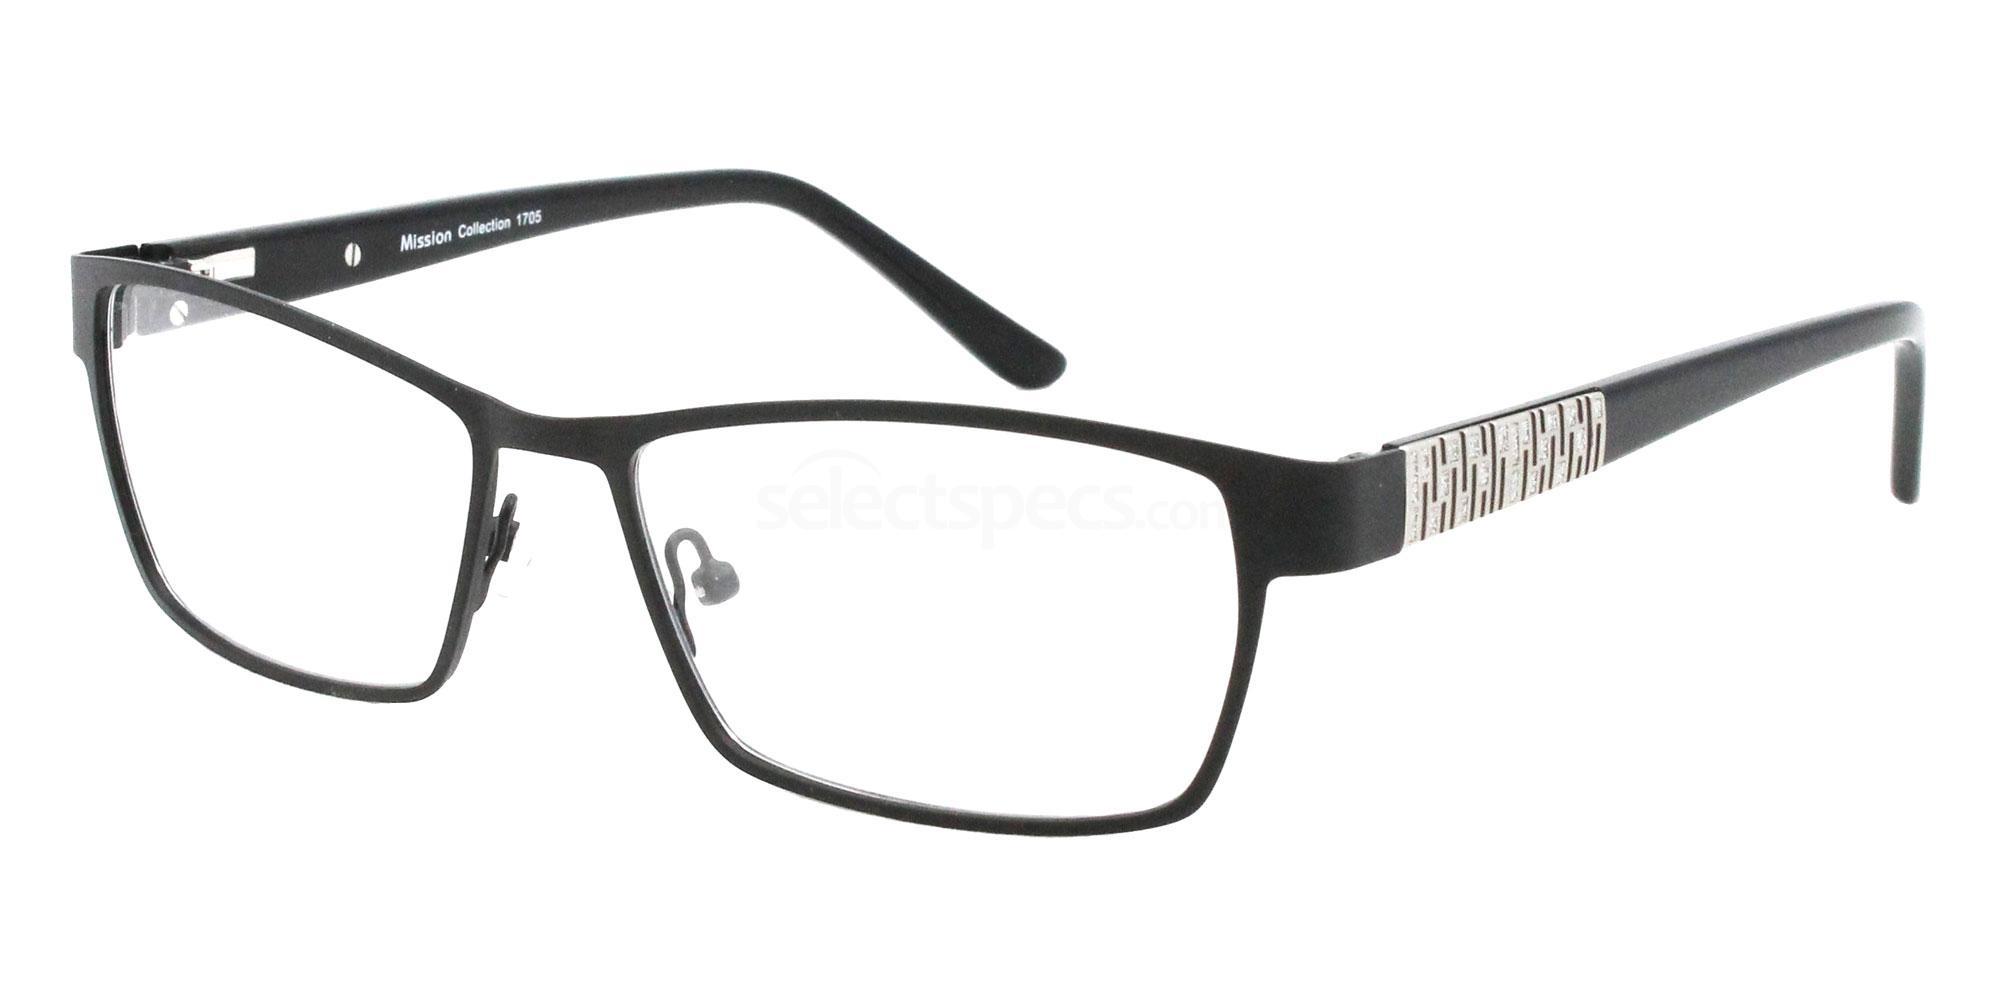 01 1705 Glasses, Mission